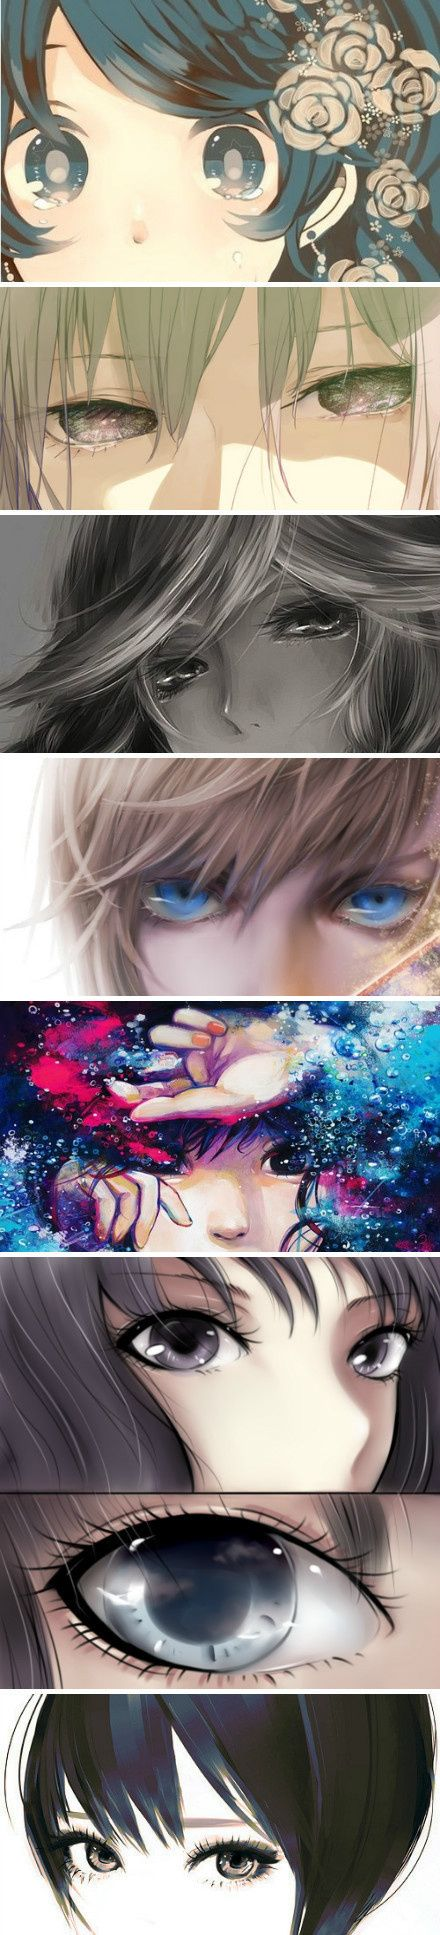 ✮ ANIME ART ✮ anime. . .eyes. . .different art styles. . .pretty. . .kawaii